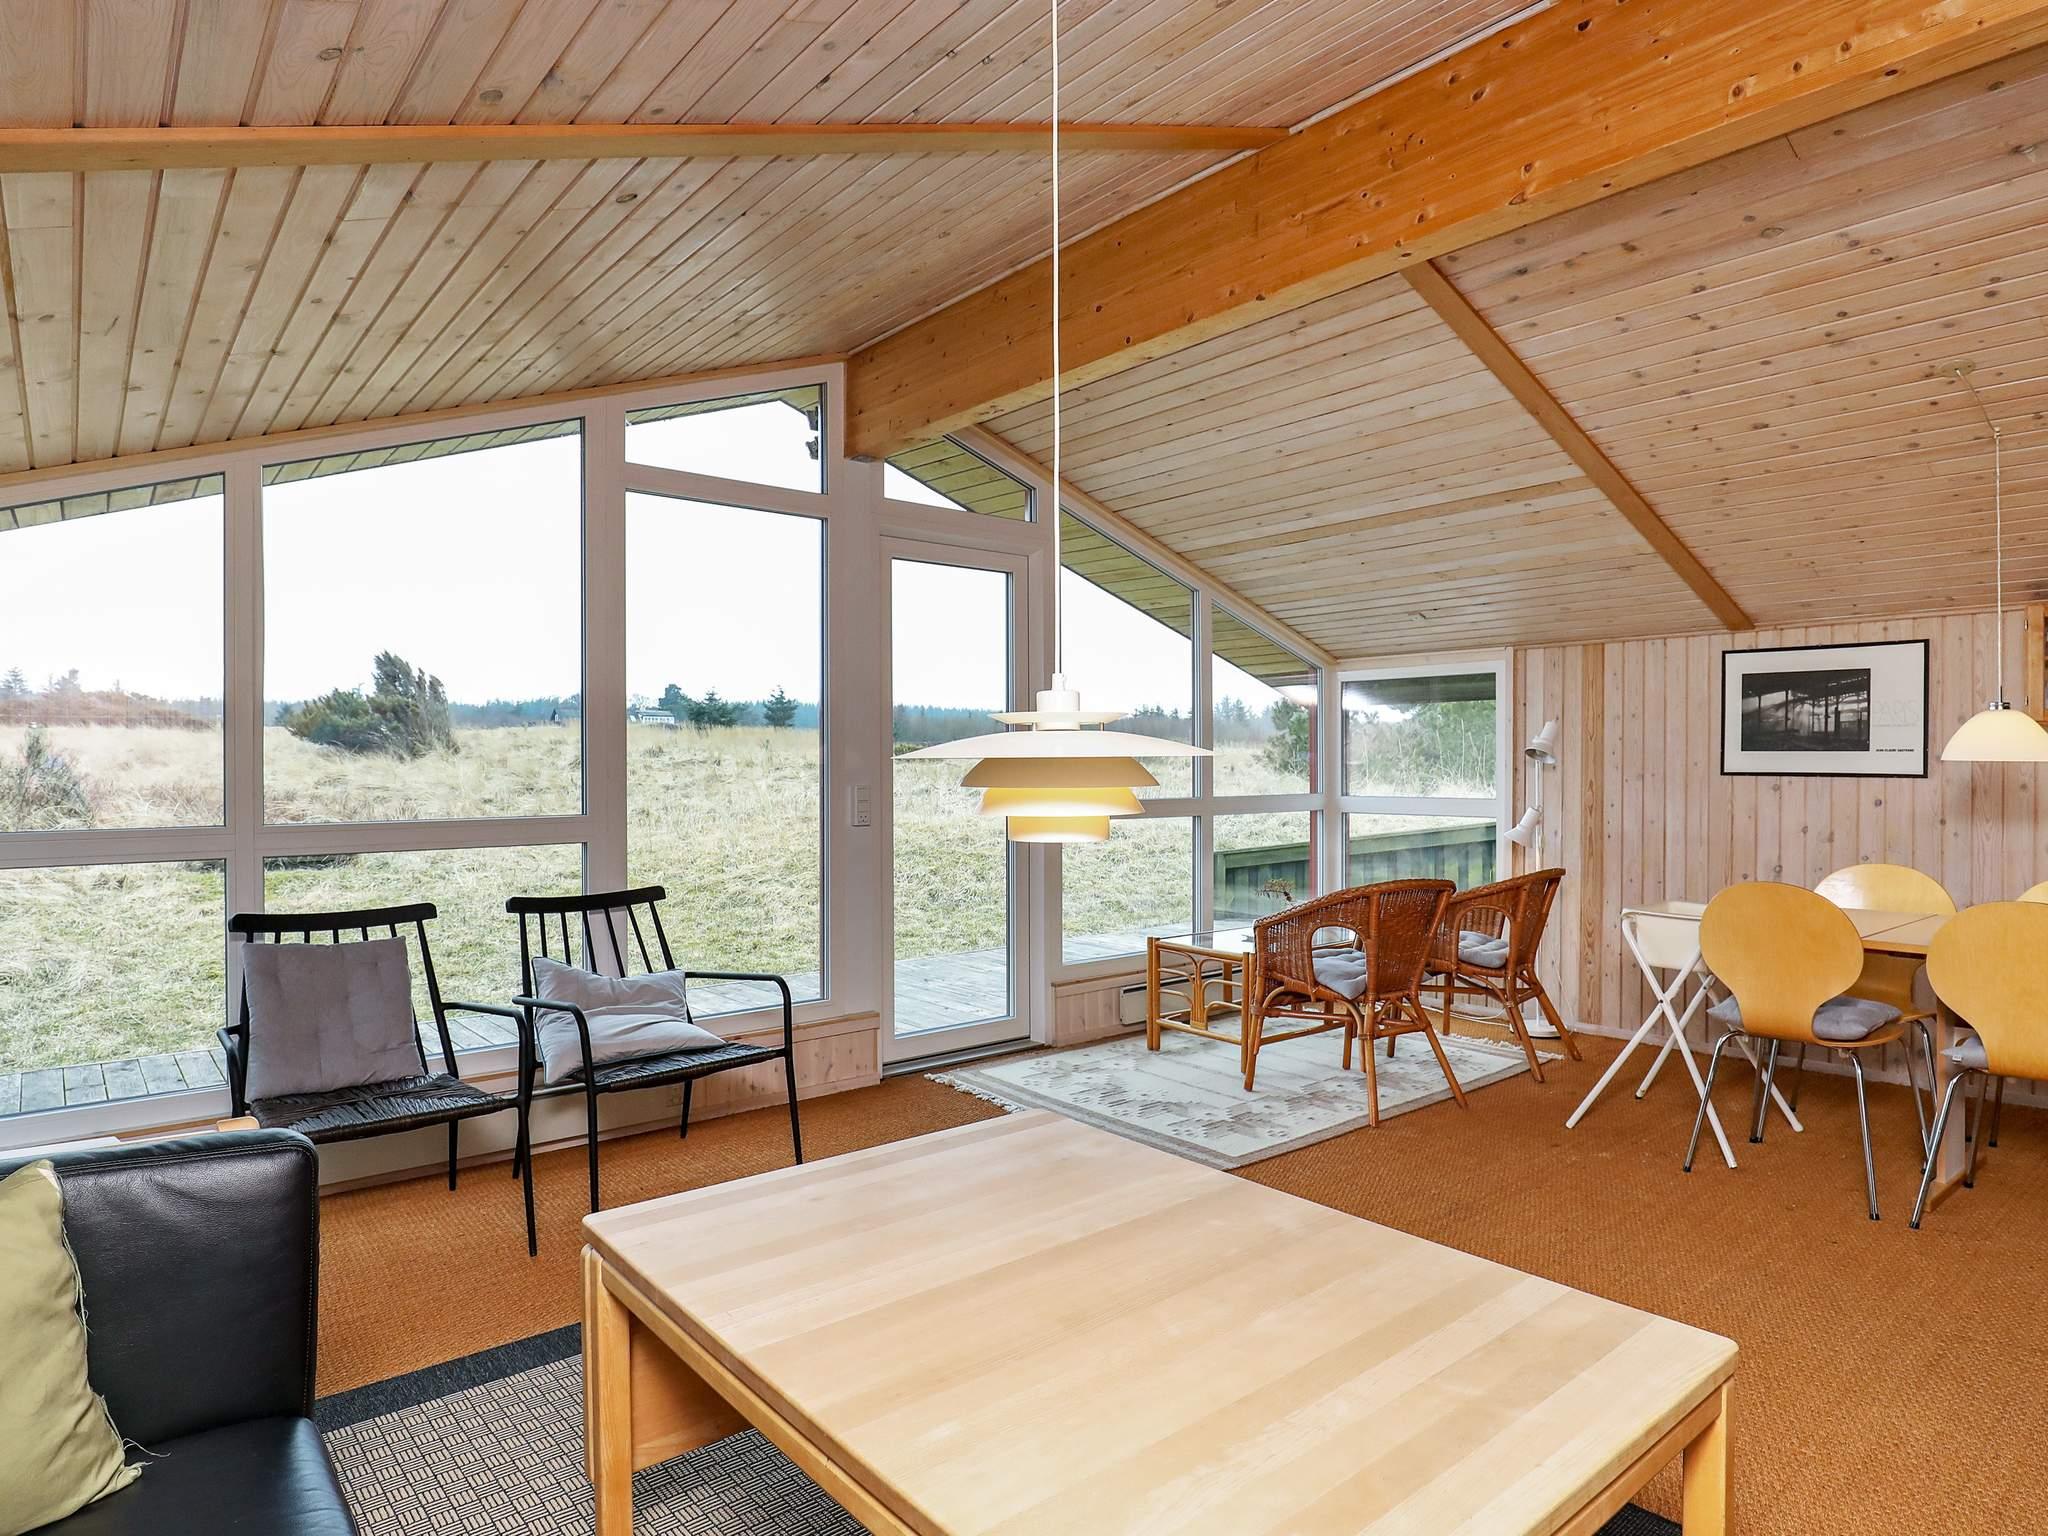 Ferienhaus Kjul Strand (319409), Hirtshals, , Dänische Nordsee, Dänemark, Bild 2